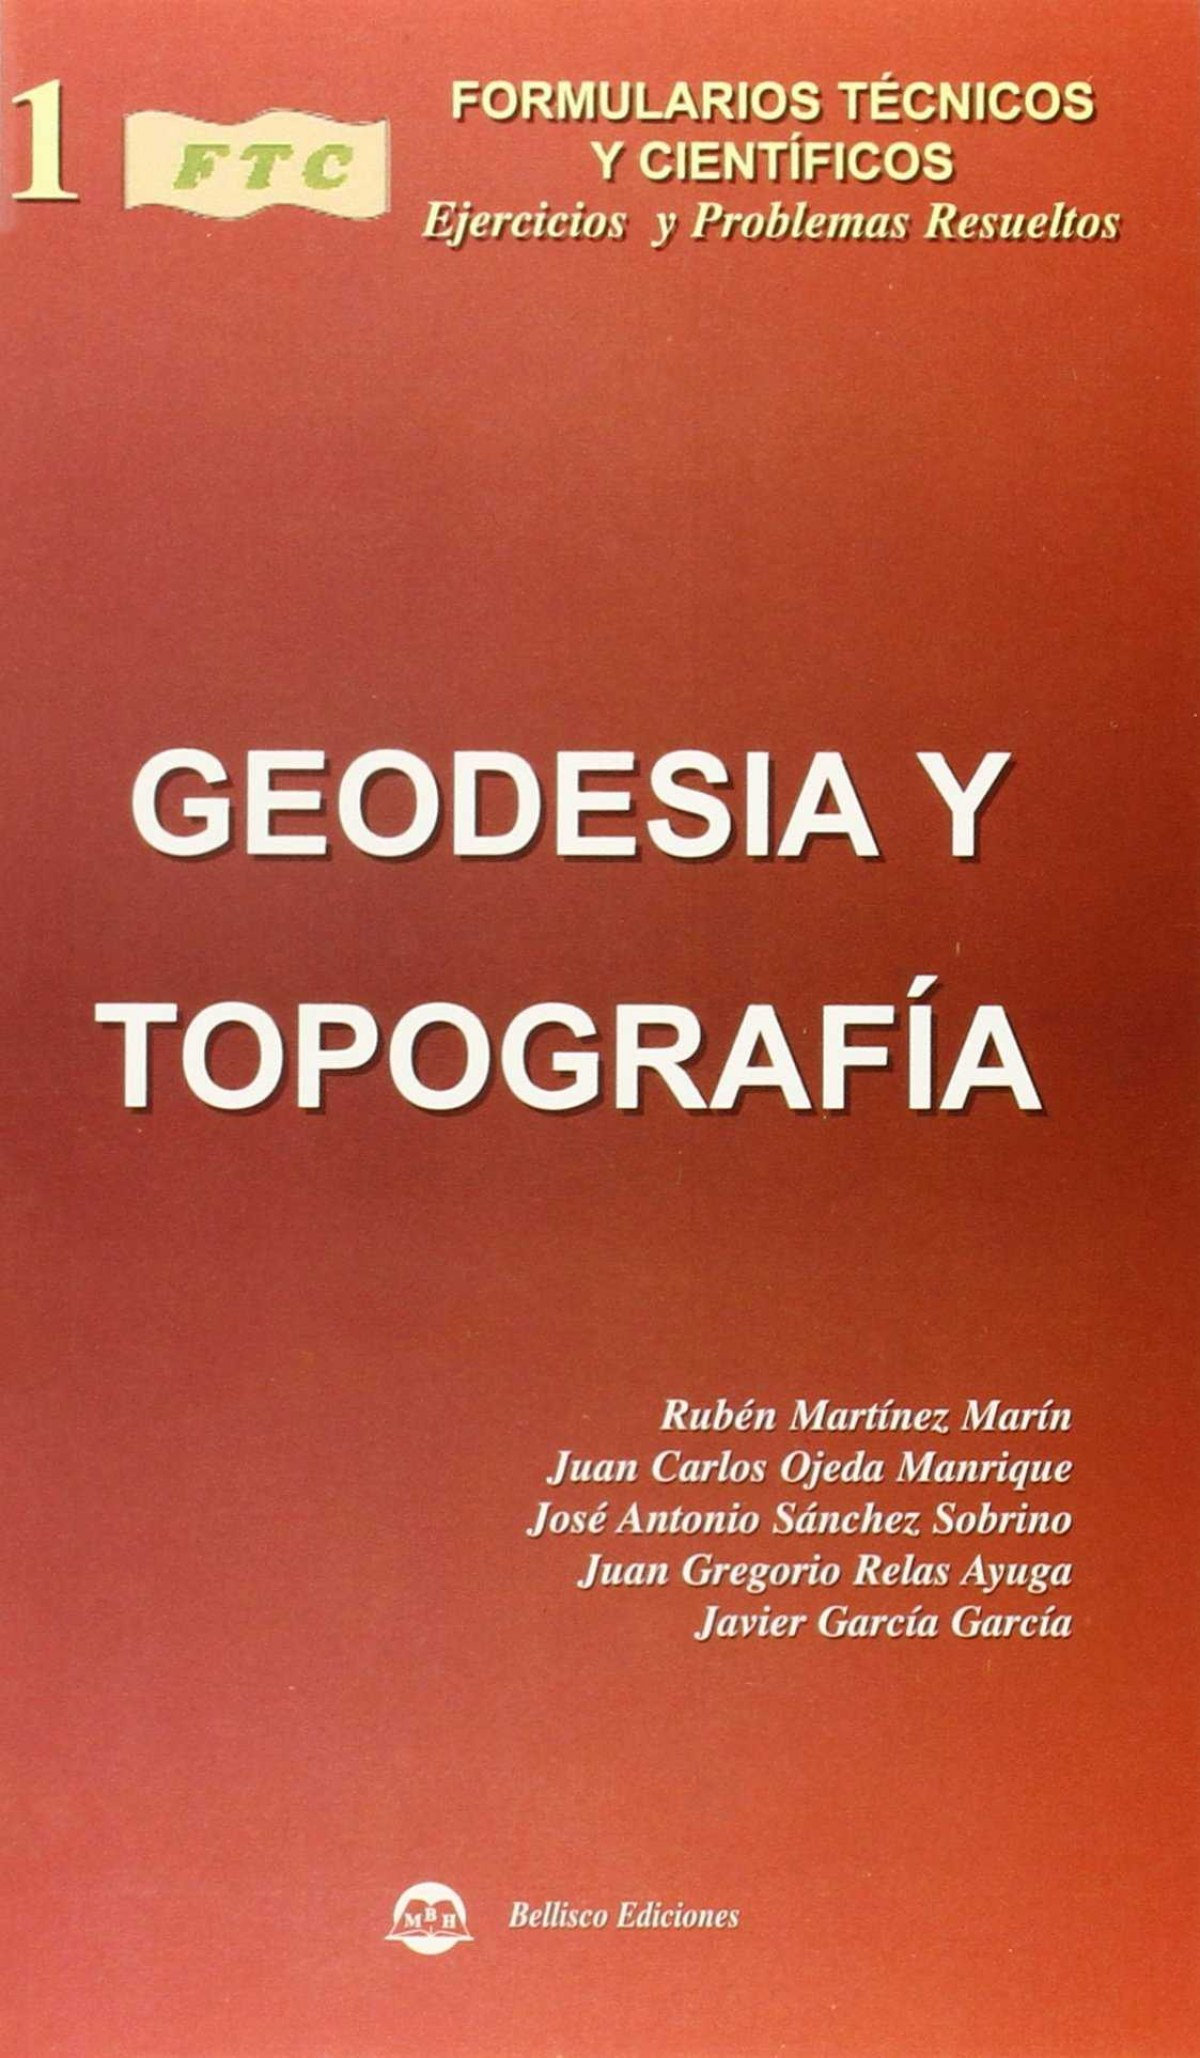 Formulario tecnico geodesia topografia problemas resueltos